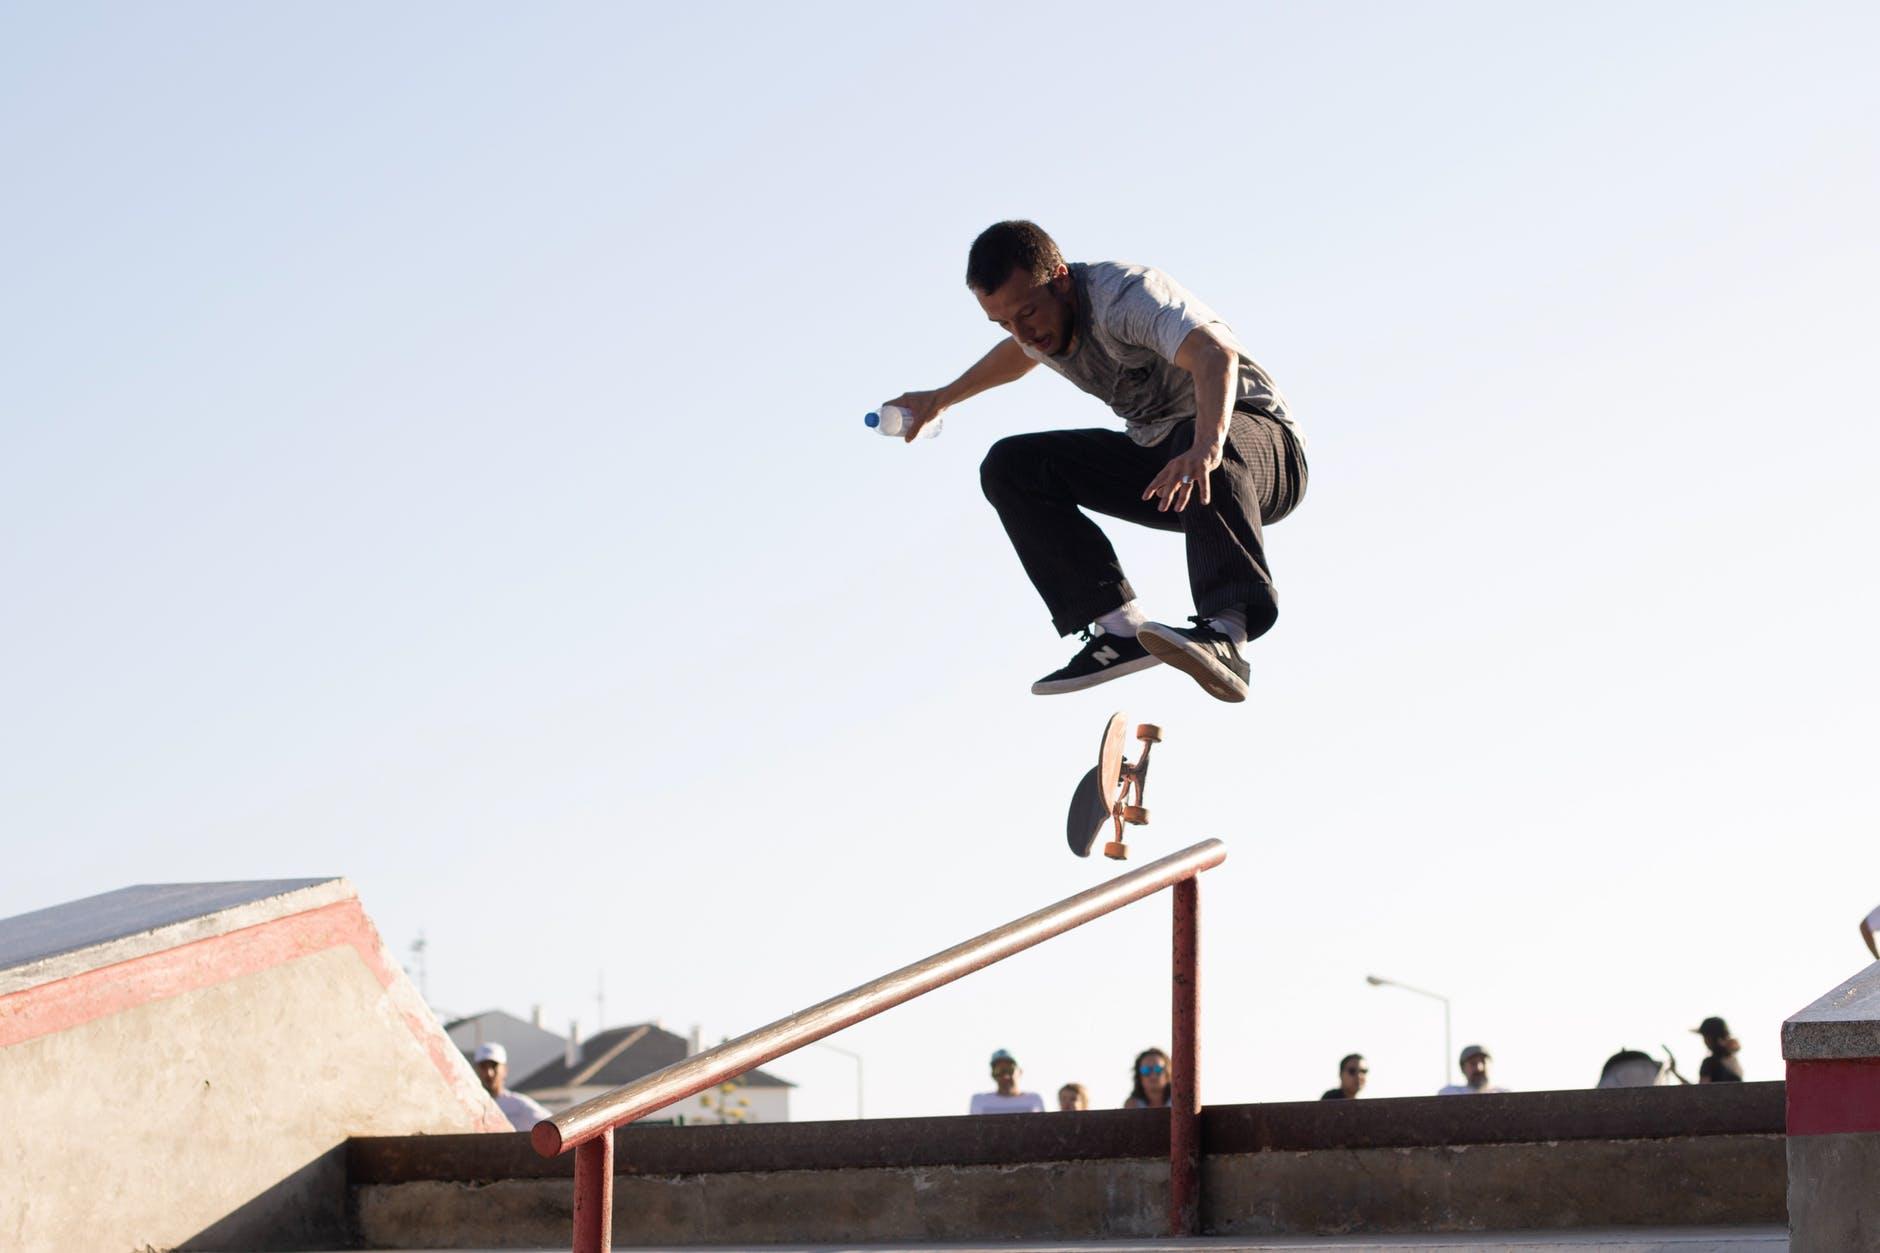 man wearing white t shirt performing skateboard tricks on rail under blue sky